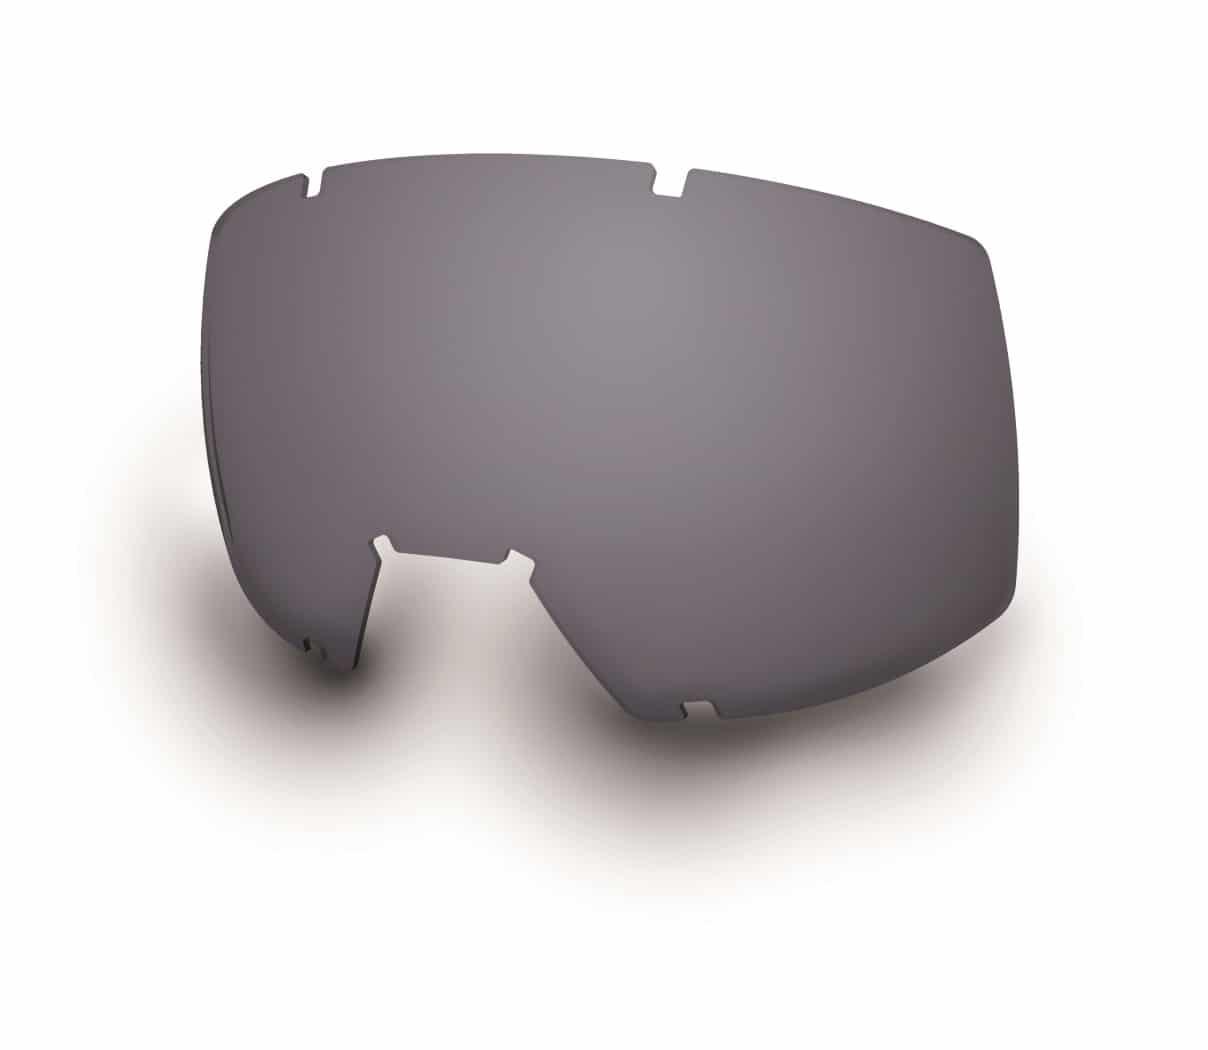 ALFA NASTEK, SCIARA, CALDERA Spare Lenses - SZA Thrama Silver DL Cat. 3